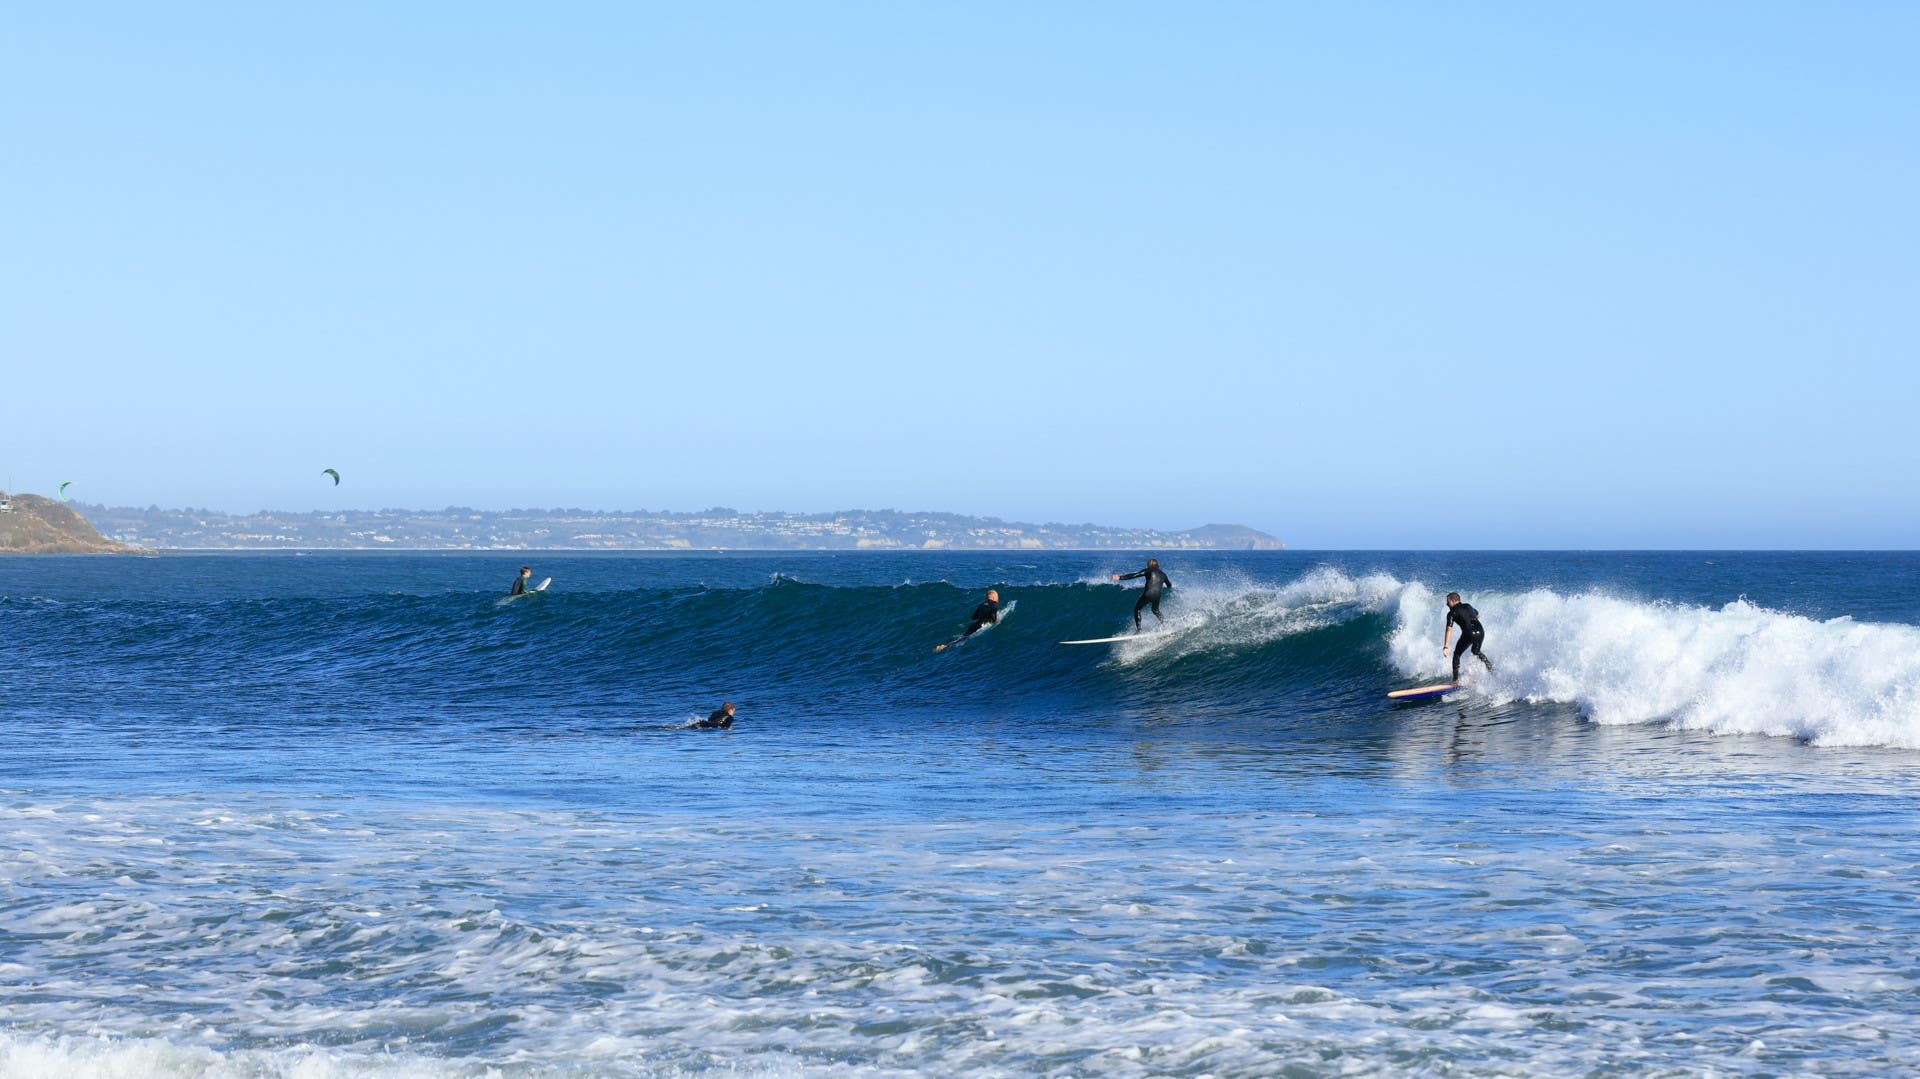 Surfers at Leo Carrillo State Beach in Malibu